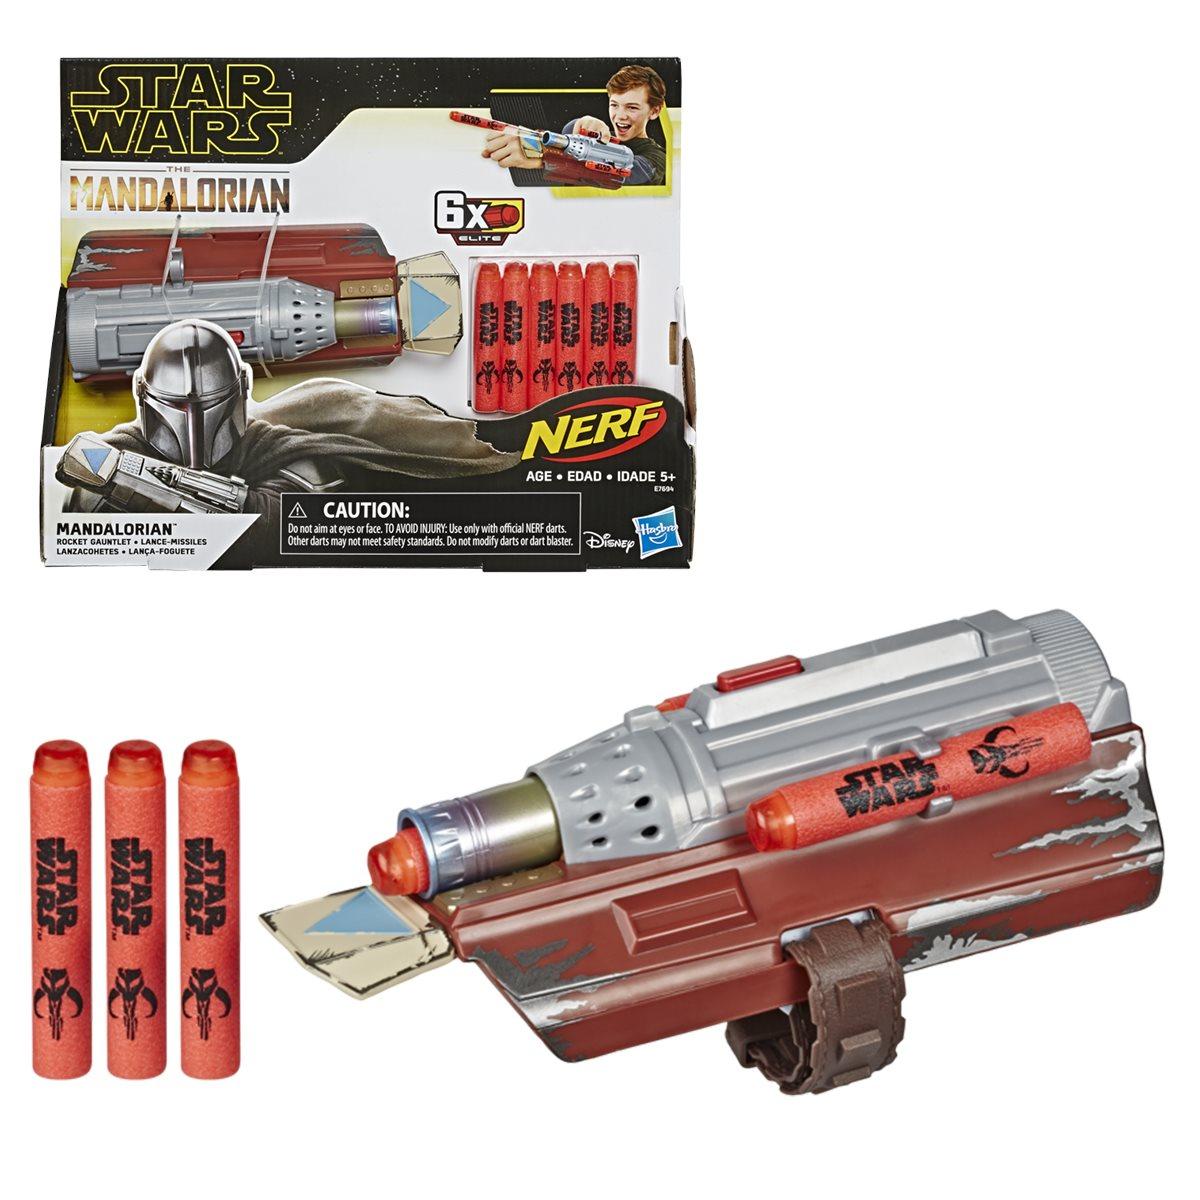 Star Wars The Mandalorian Rocket Gauntlet Nerf Dart Launcher